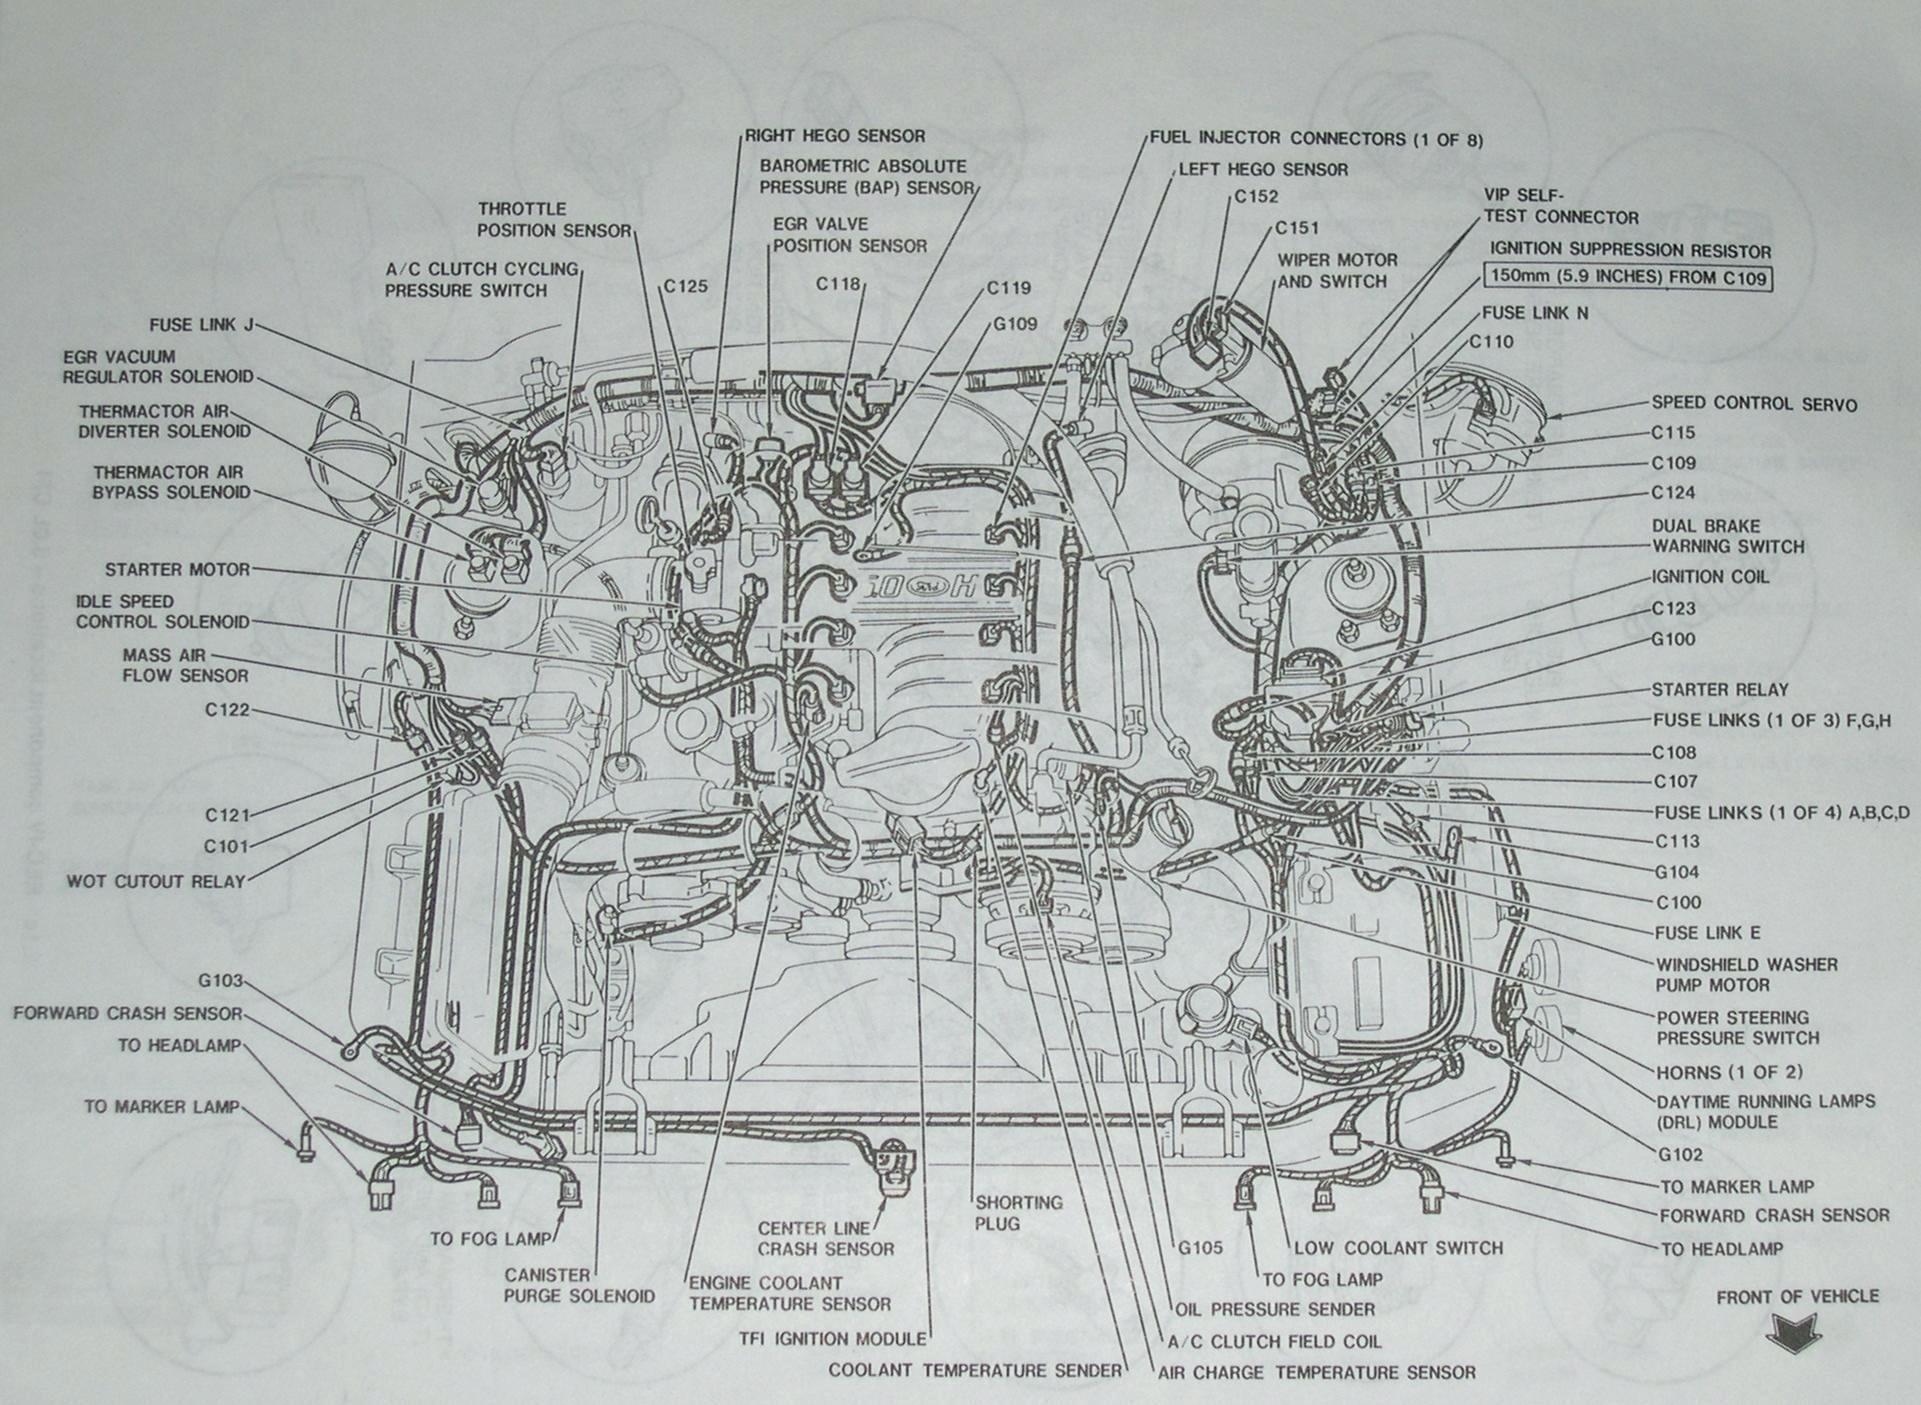 99 Accord Fuse Diagram Auto Electrical Wiring 2005 Honda Brake Light C110